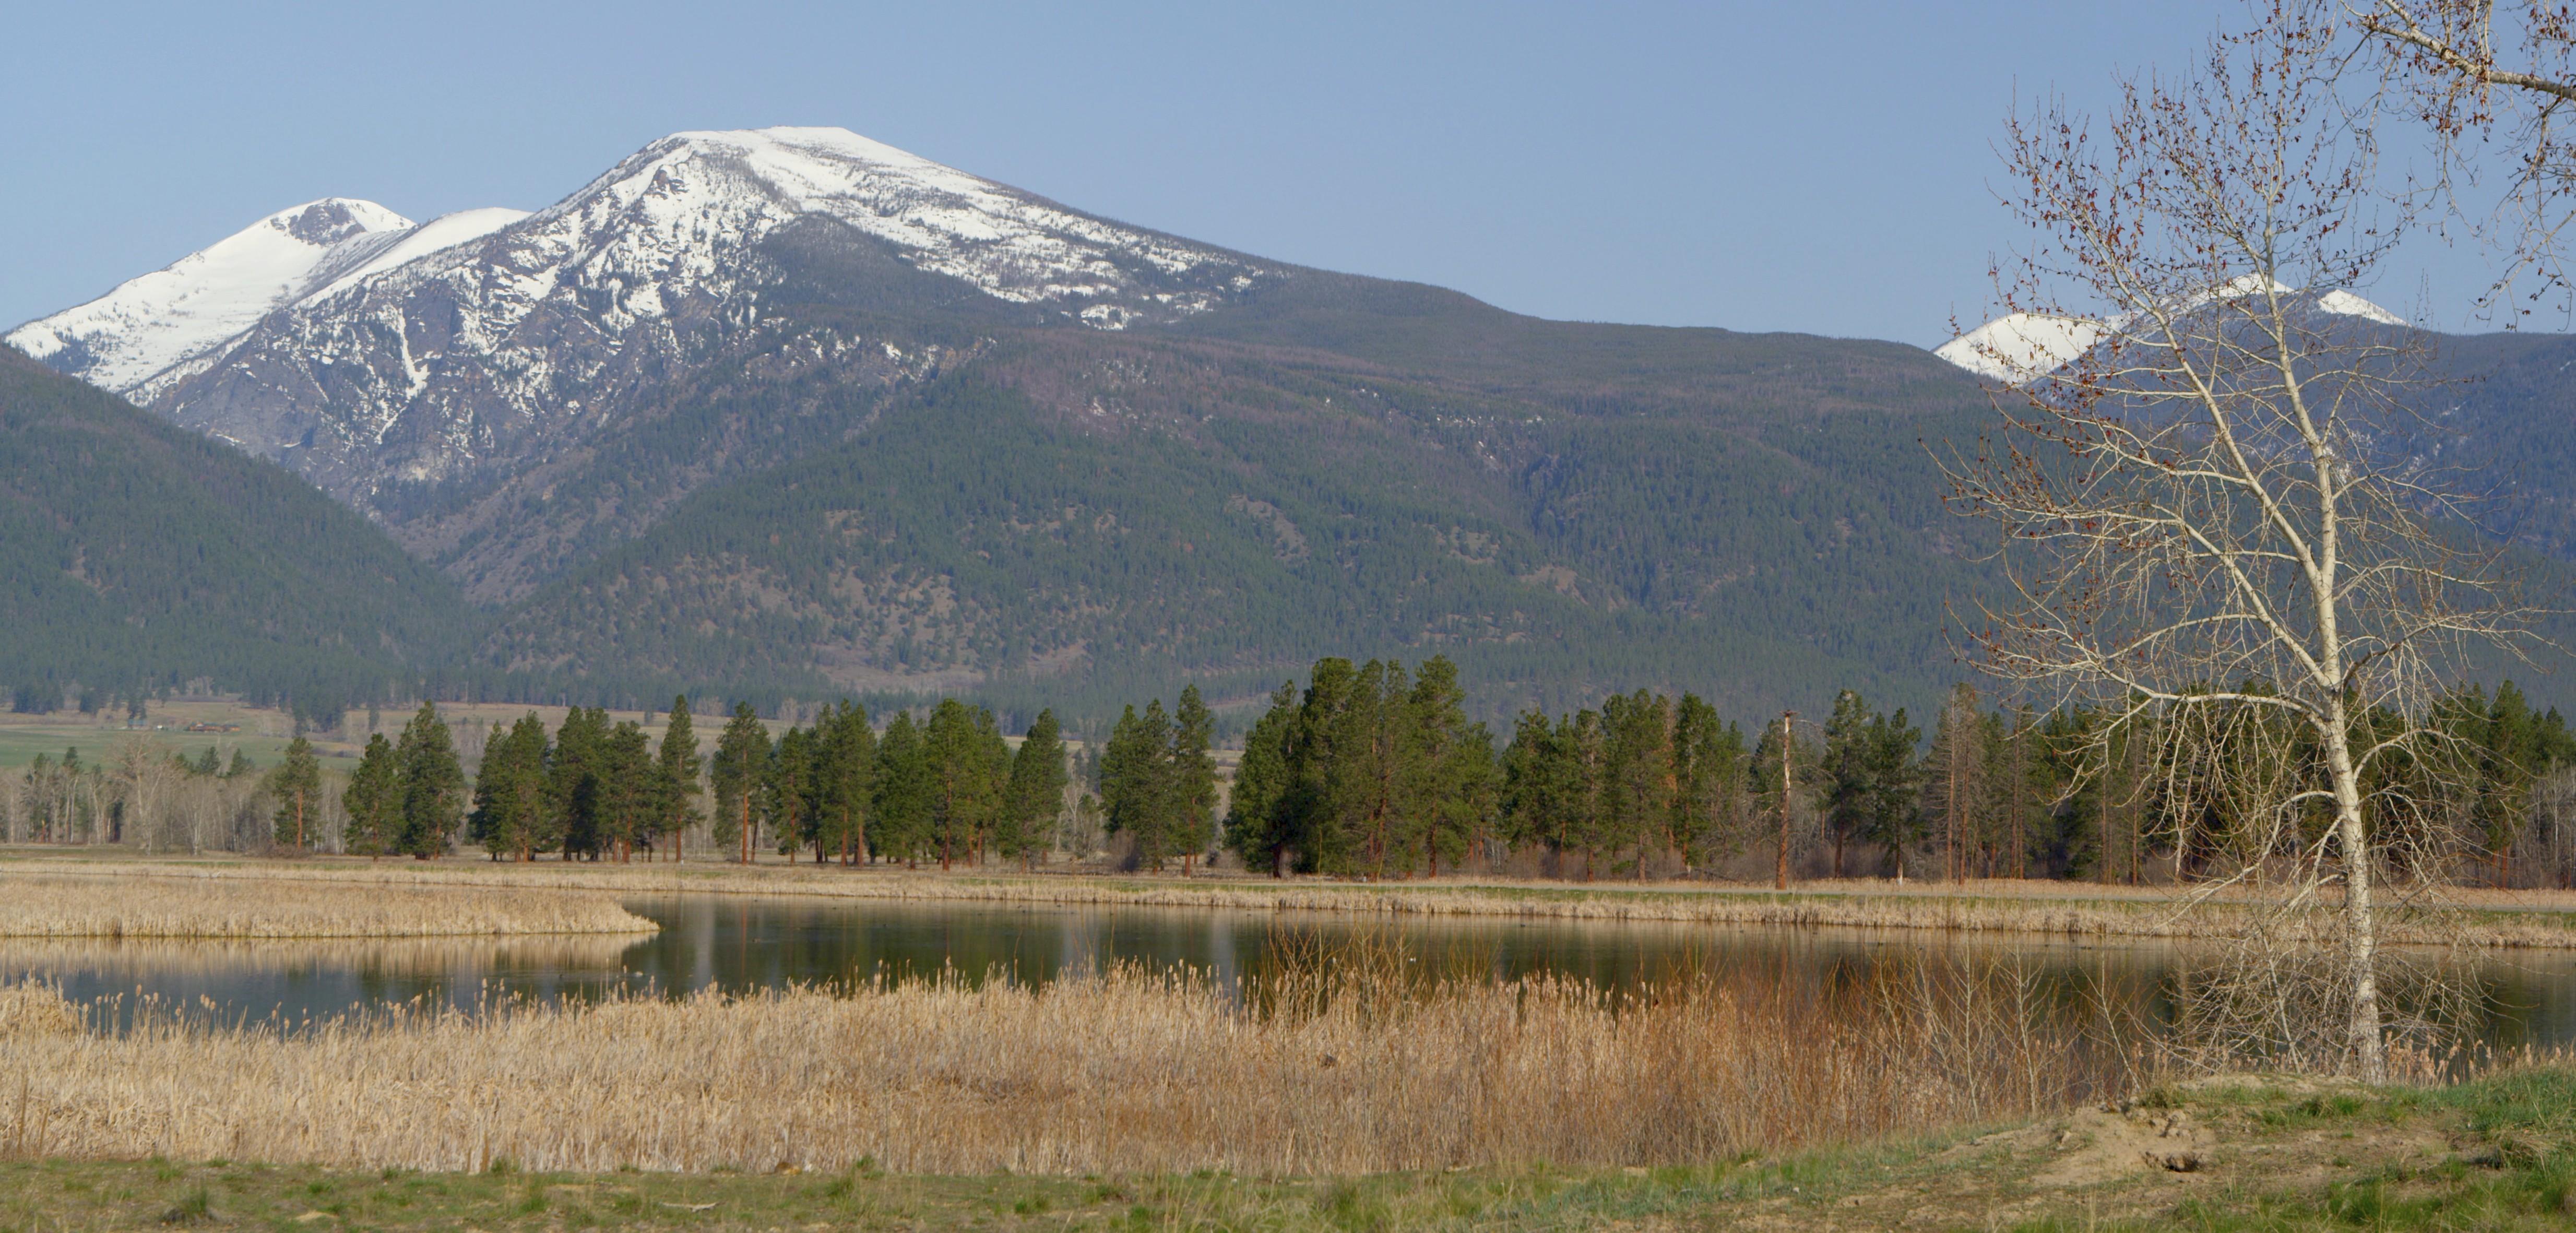 Mountains, National Bison Range, Moise, Montana